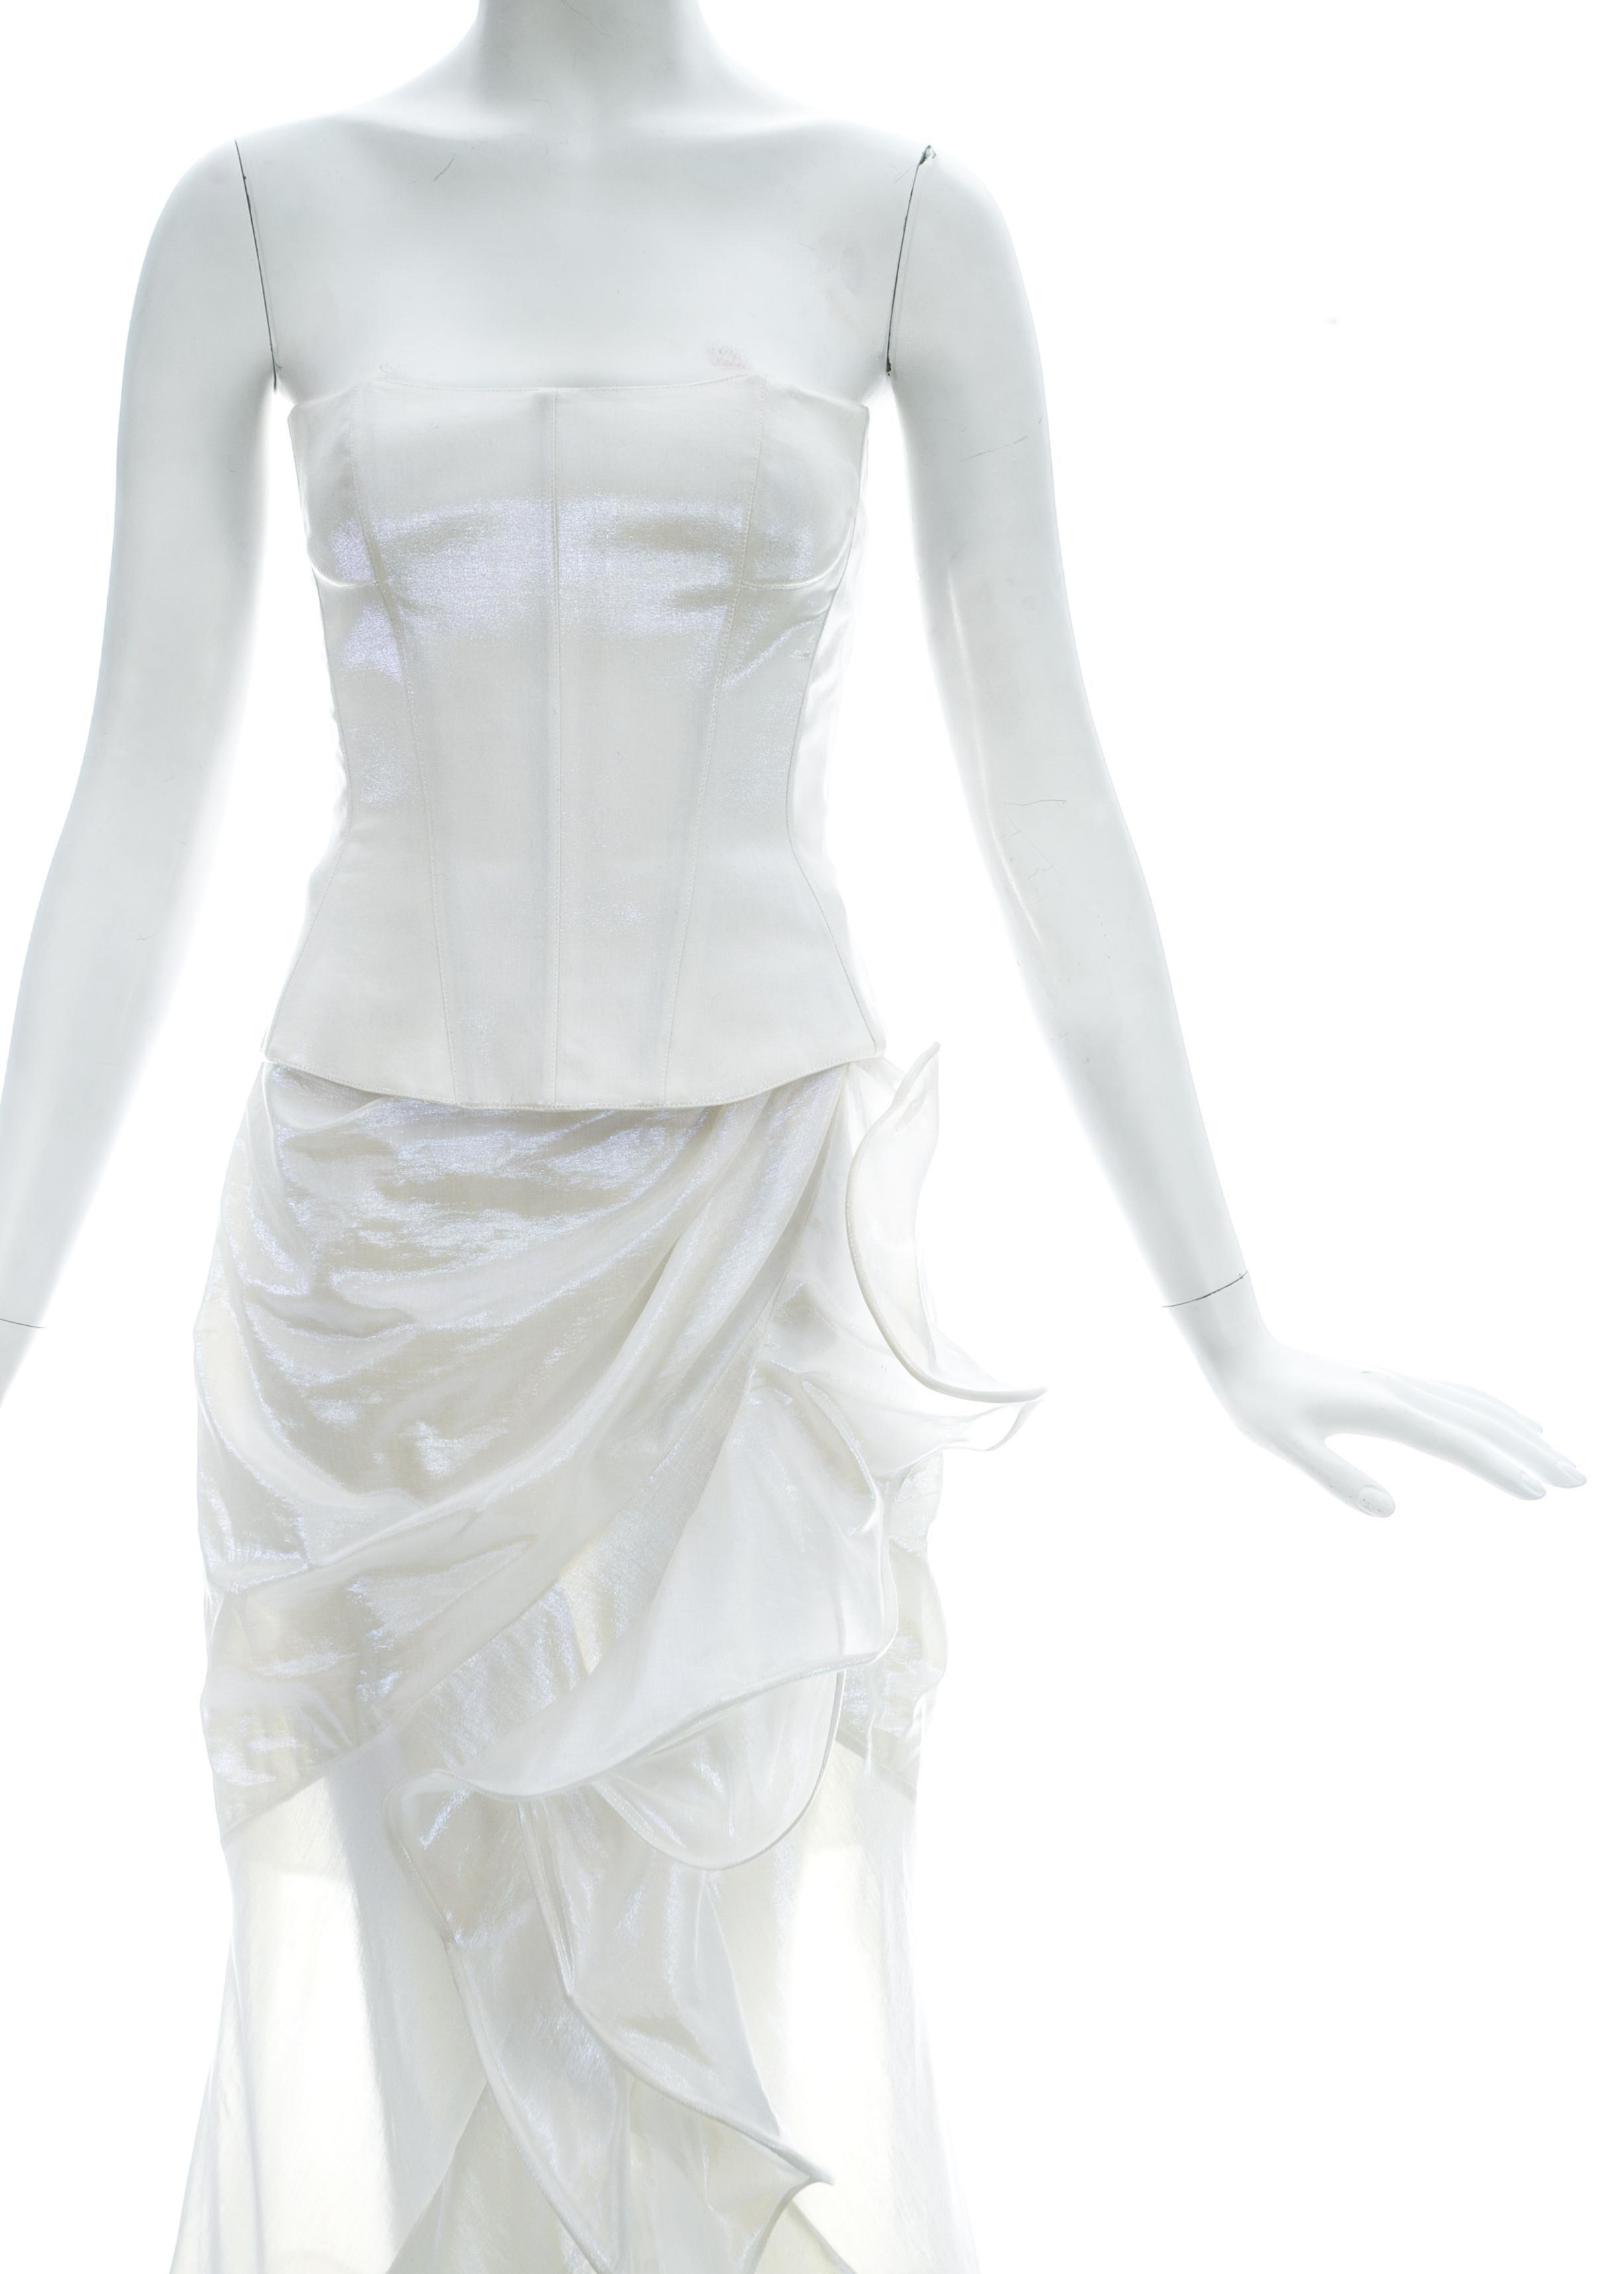 c82809631aa Thierry Mugler metallic pearl white corset and ruffled skirt ensemble